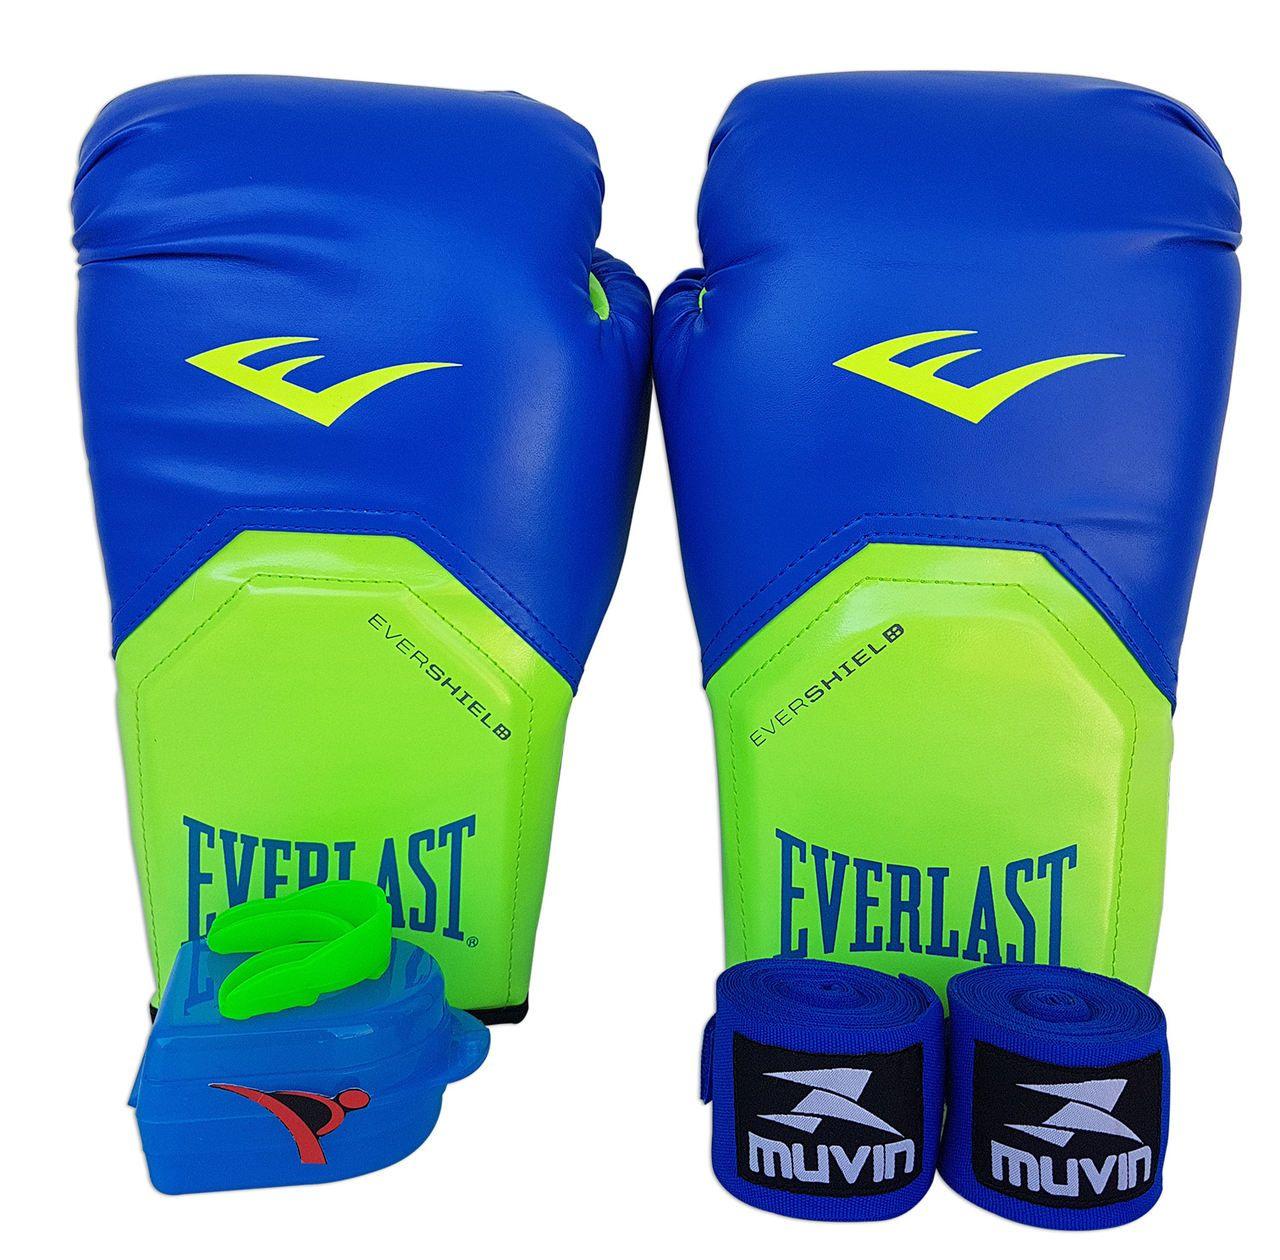 4a5b3efc1 Kit de Boxe   Muay Thai 12oz - Azul com Verde - Pro Style - Everlast ...